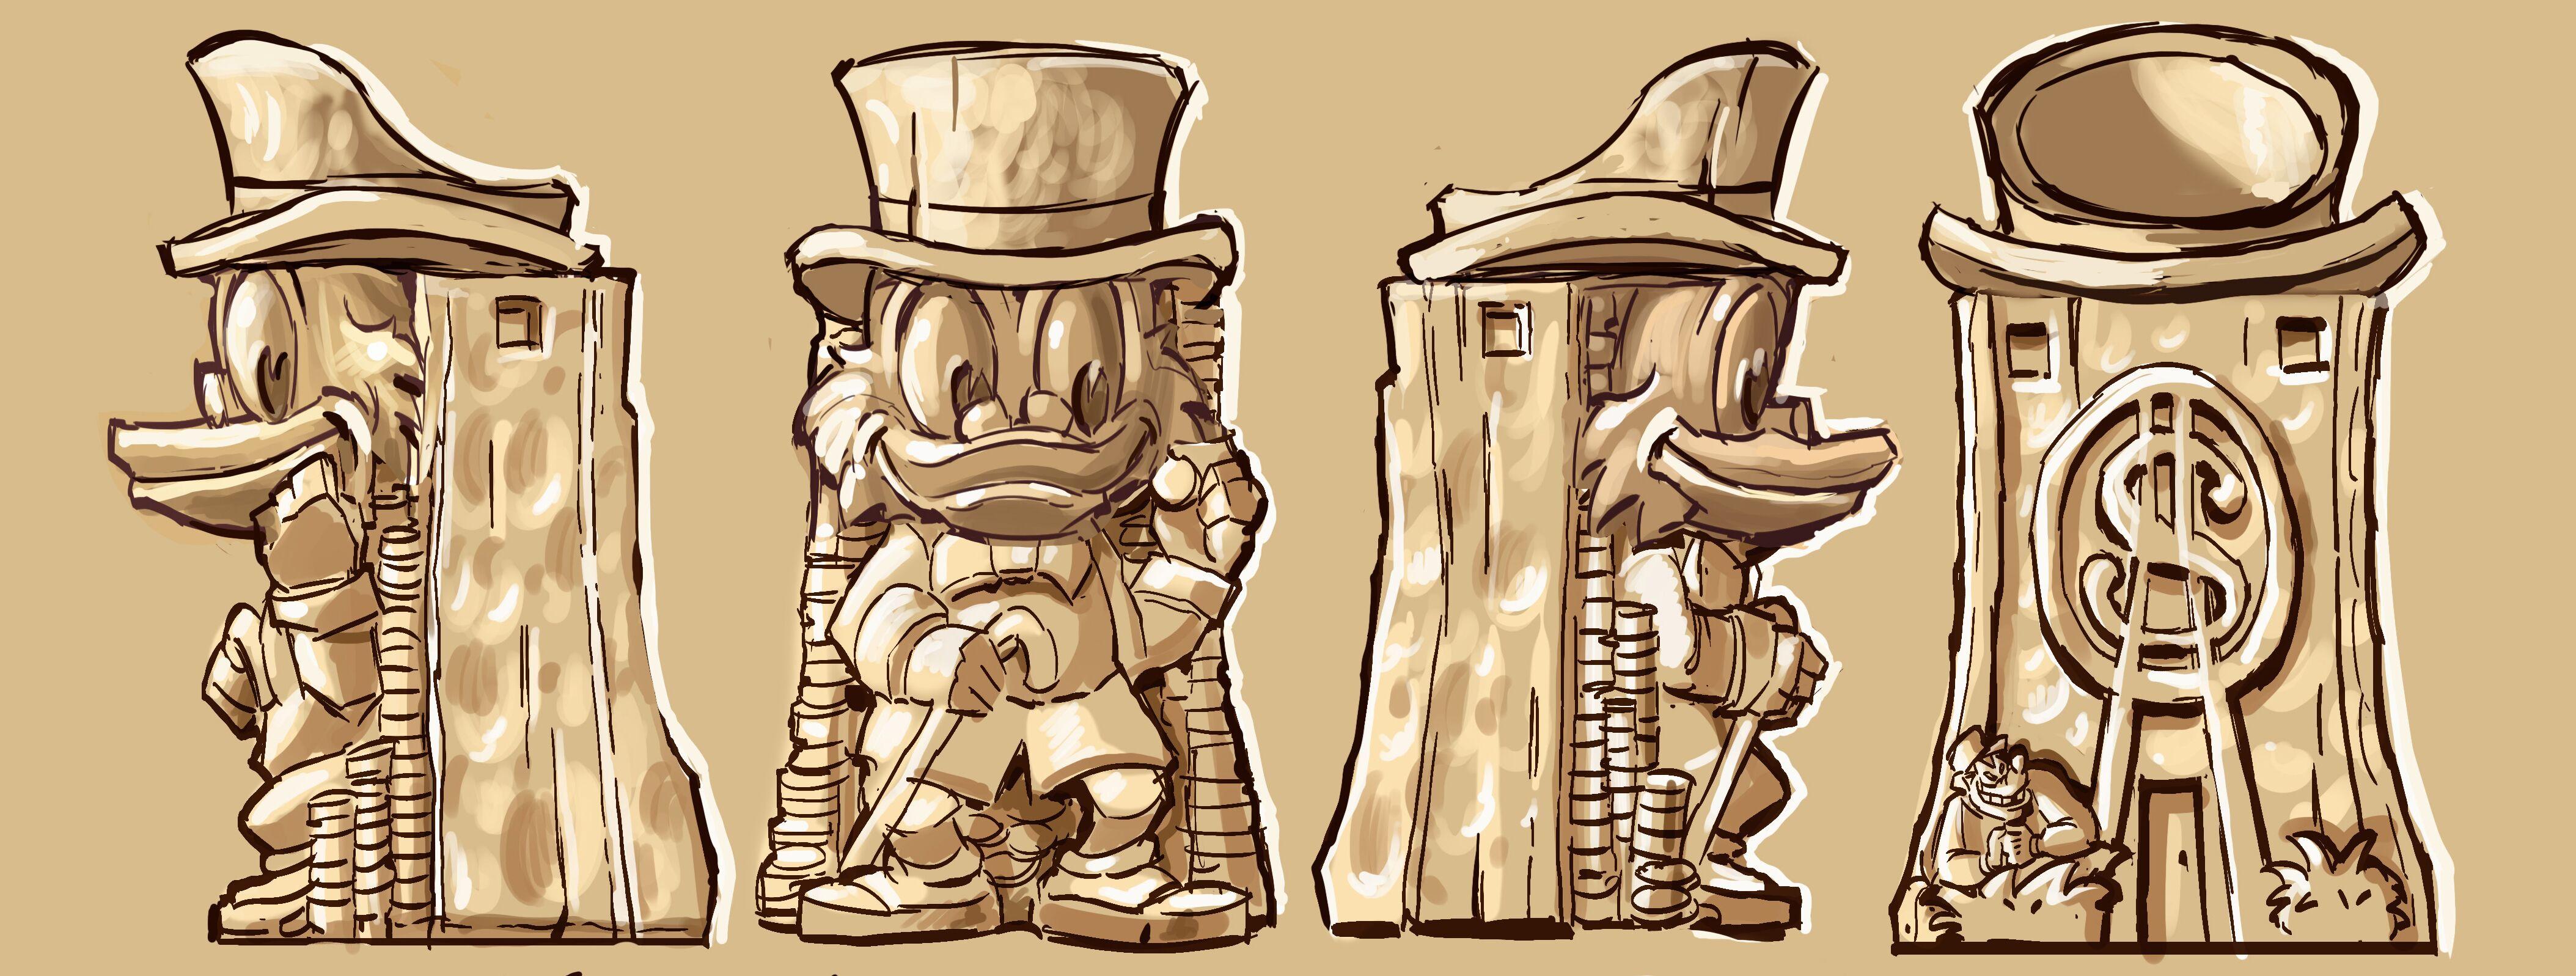 Mondo-Scrooge-McDuck-Tiki-Concept